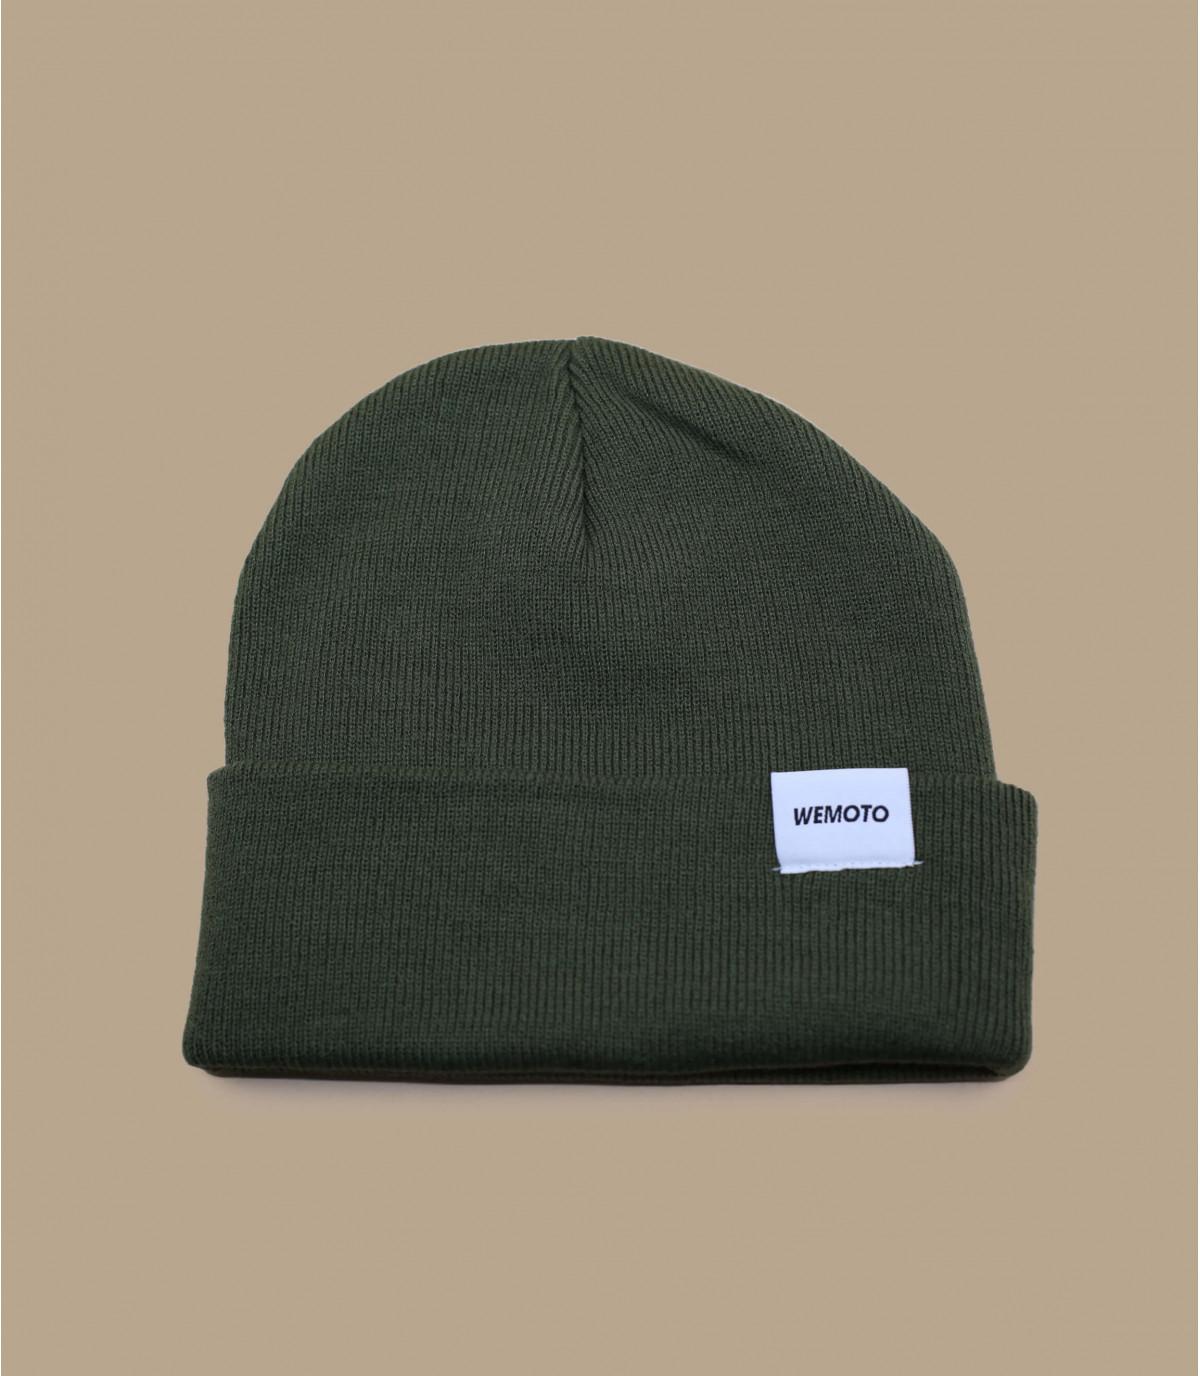 bonnet revers vert Wemoto